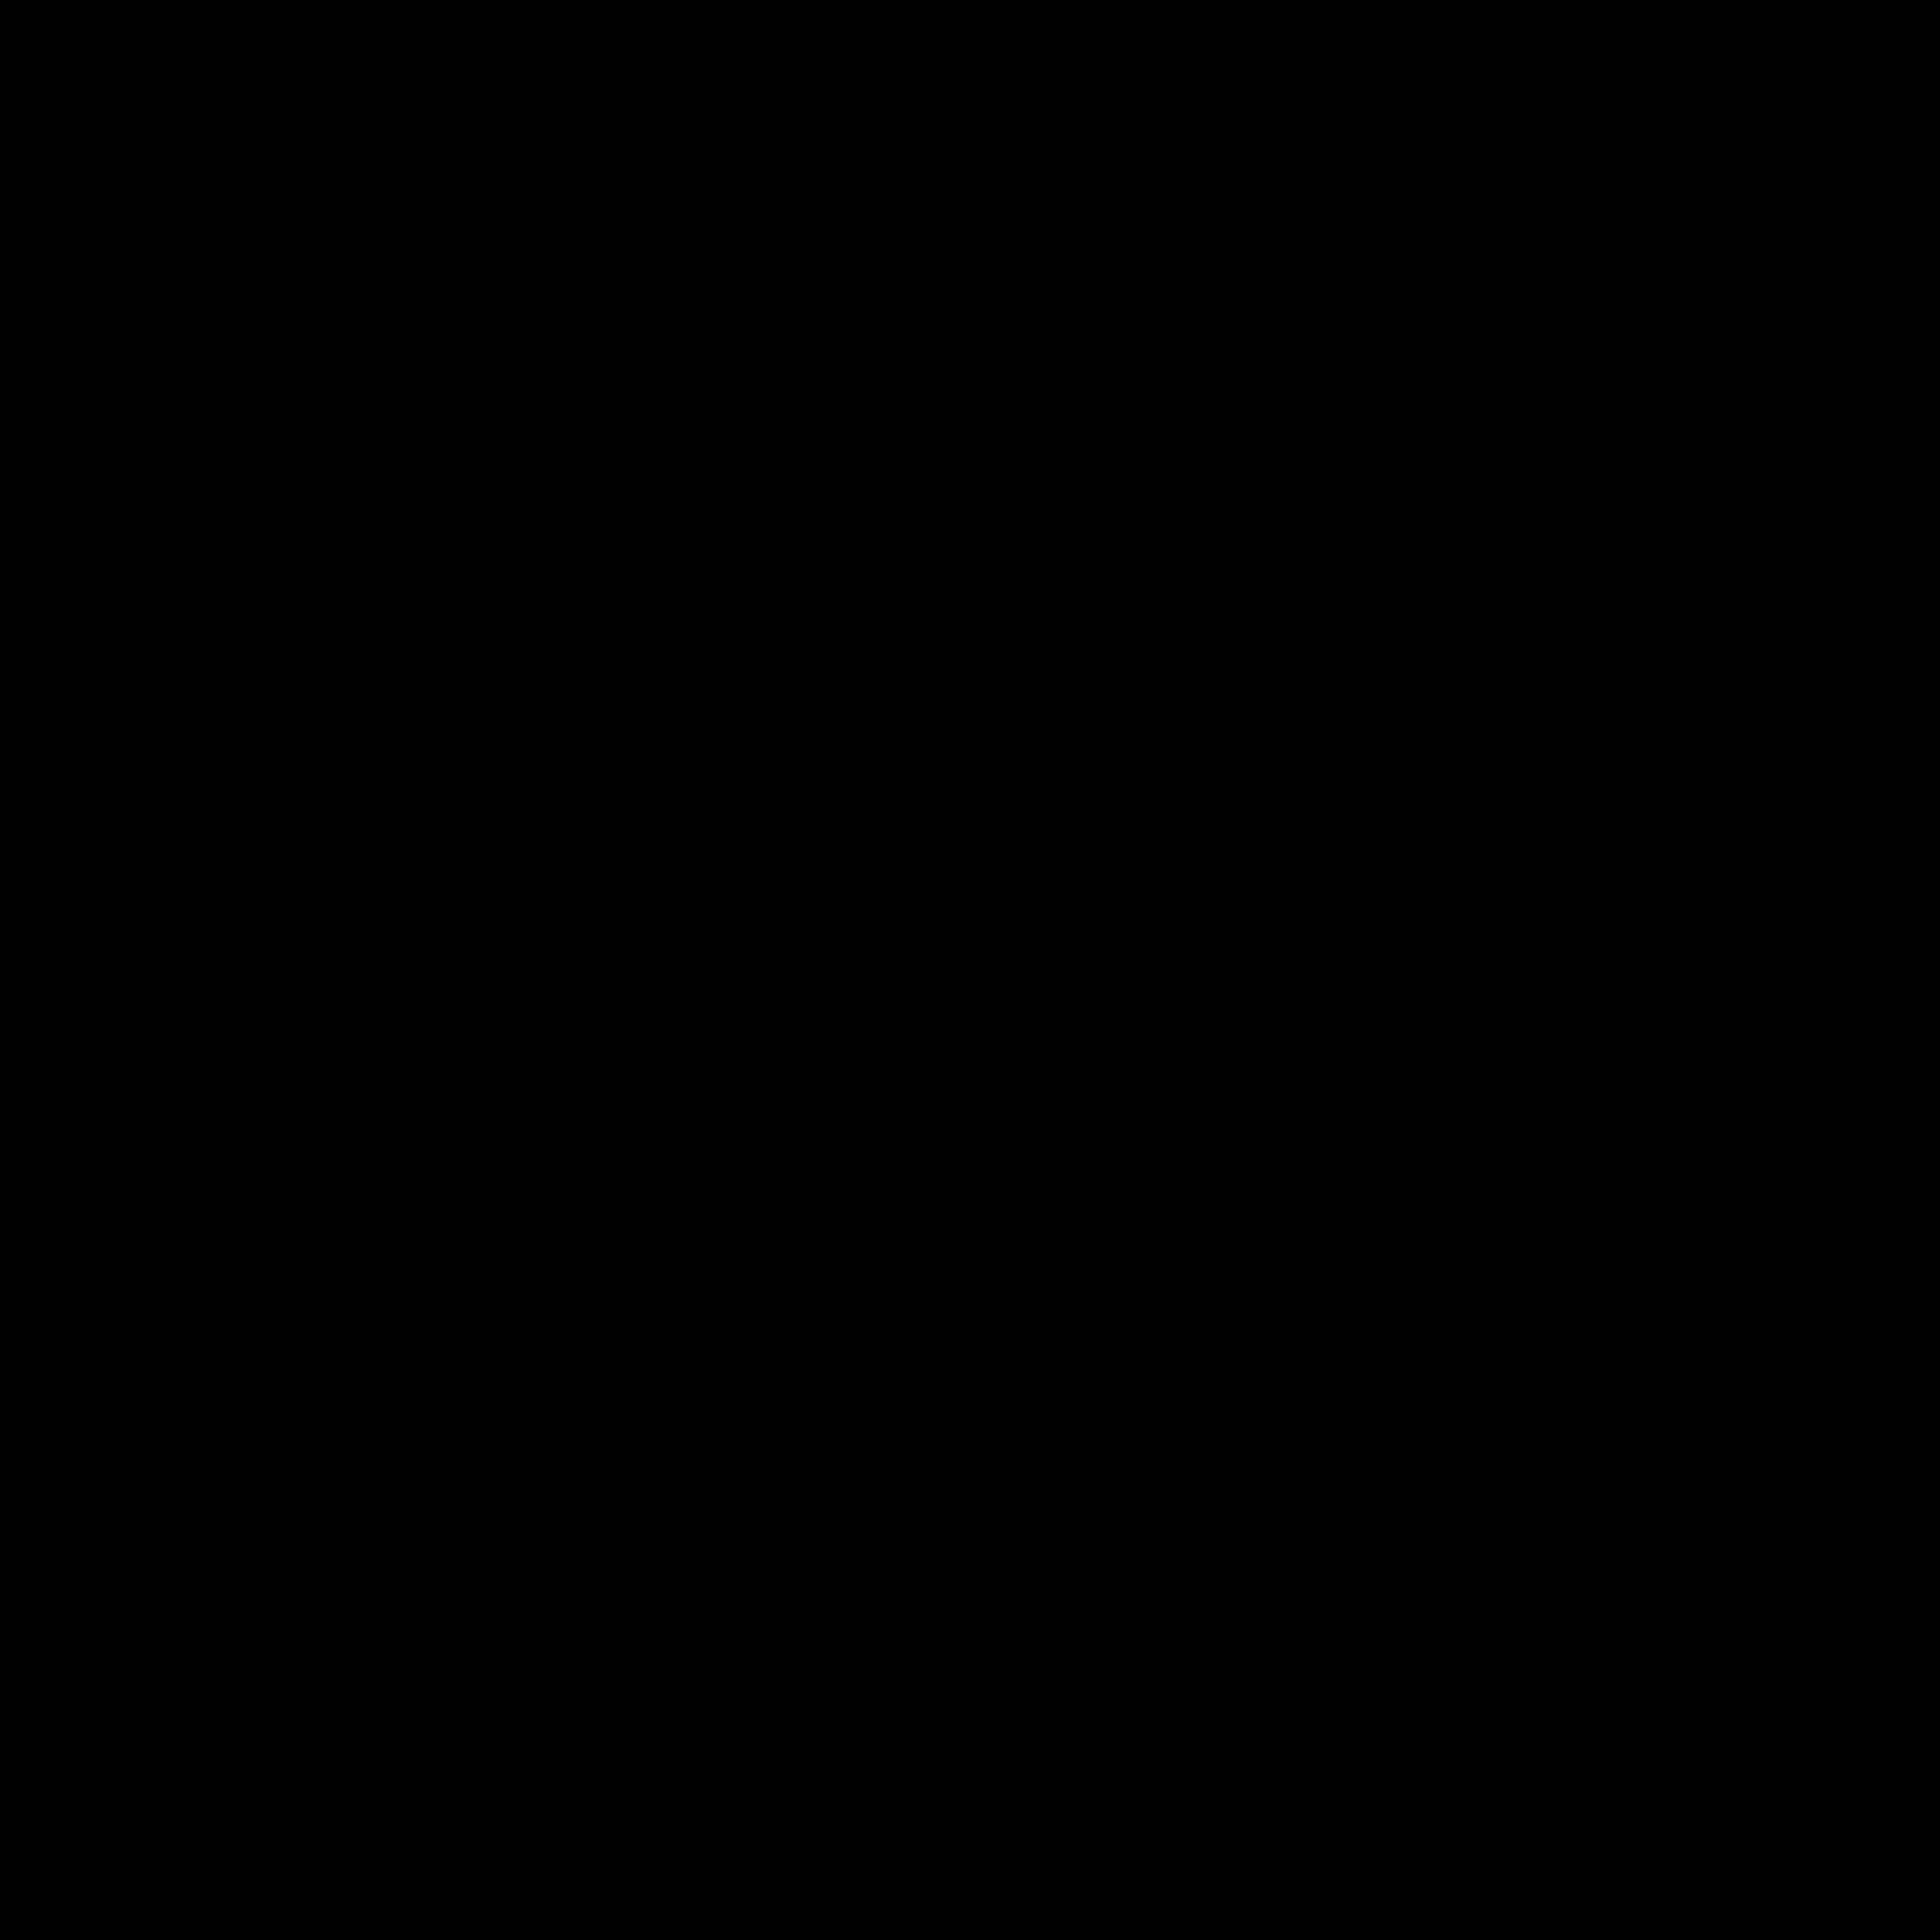 File letterr svg wikimedia. R clipart letter number